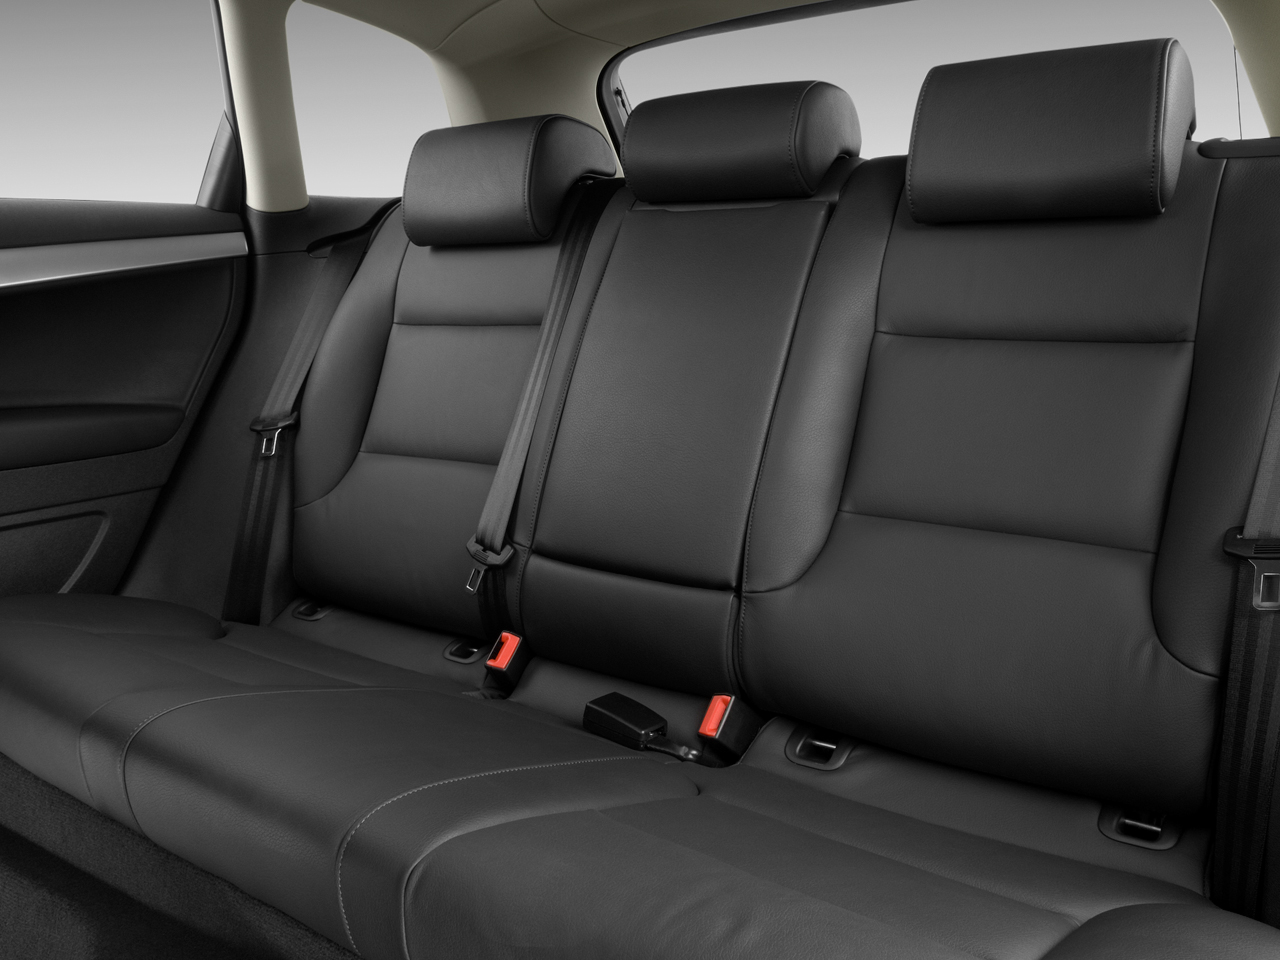 2009 Audi A3 2 0t Quattro Audi Luxury Wagon Review